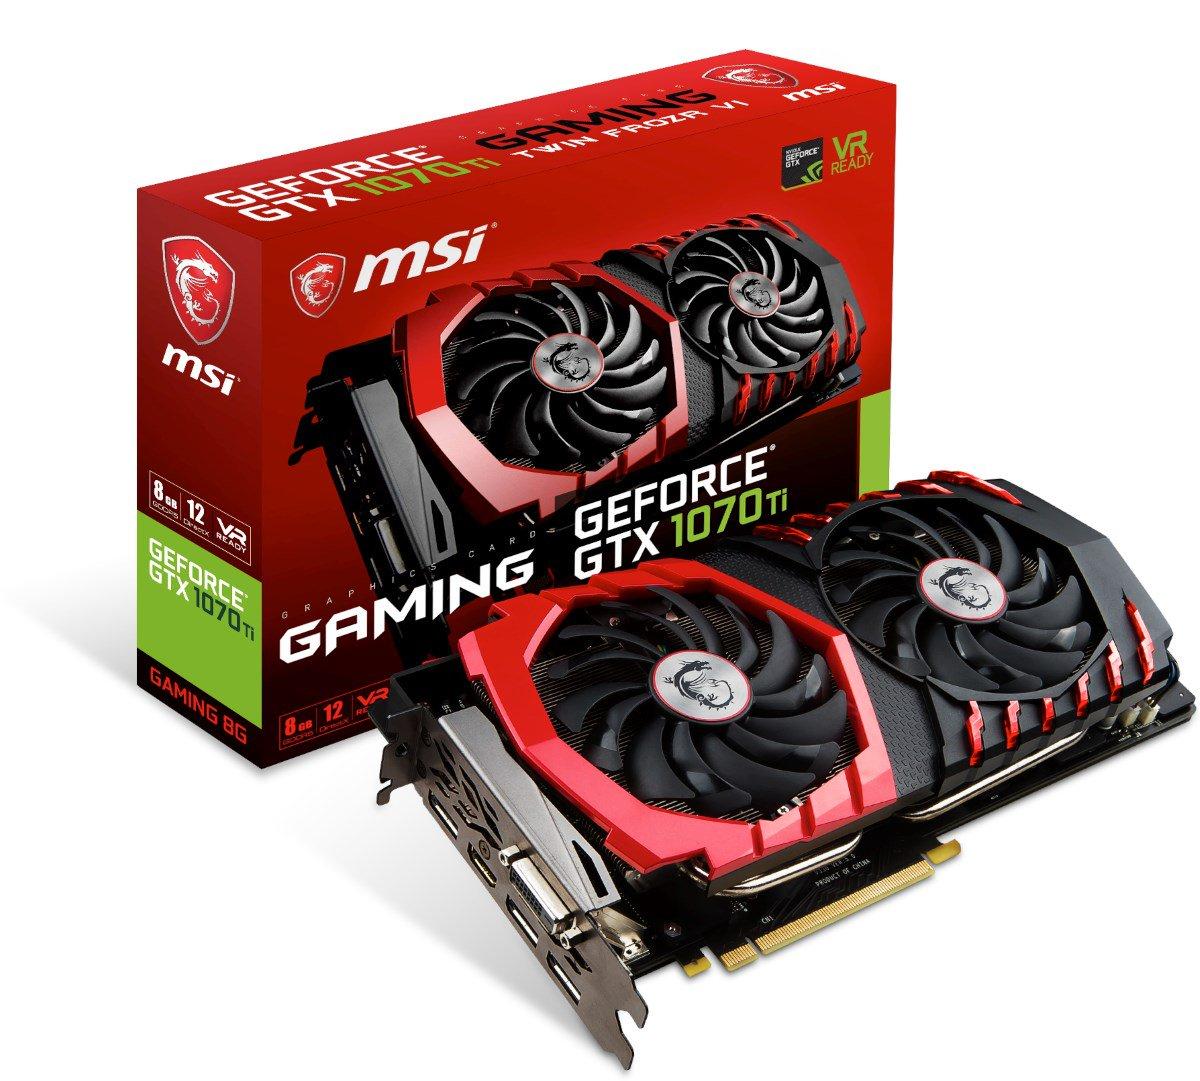 MSI GeForce GTX 1070 Ti GAMING 8GB Graphics Card £419.99 @ CCL